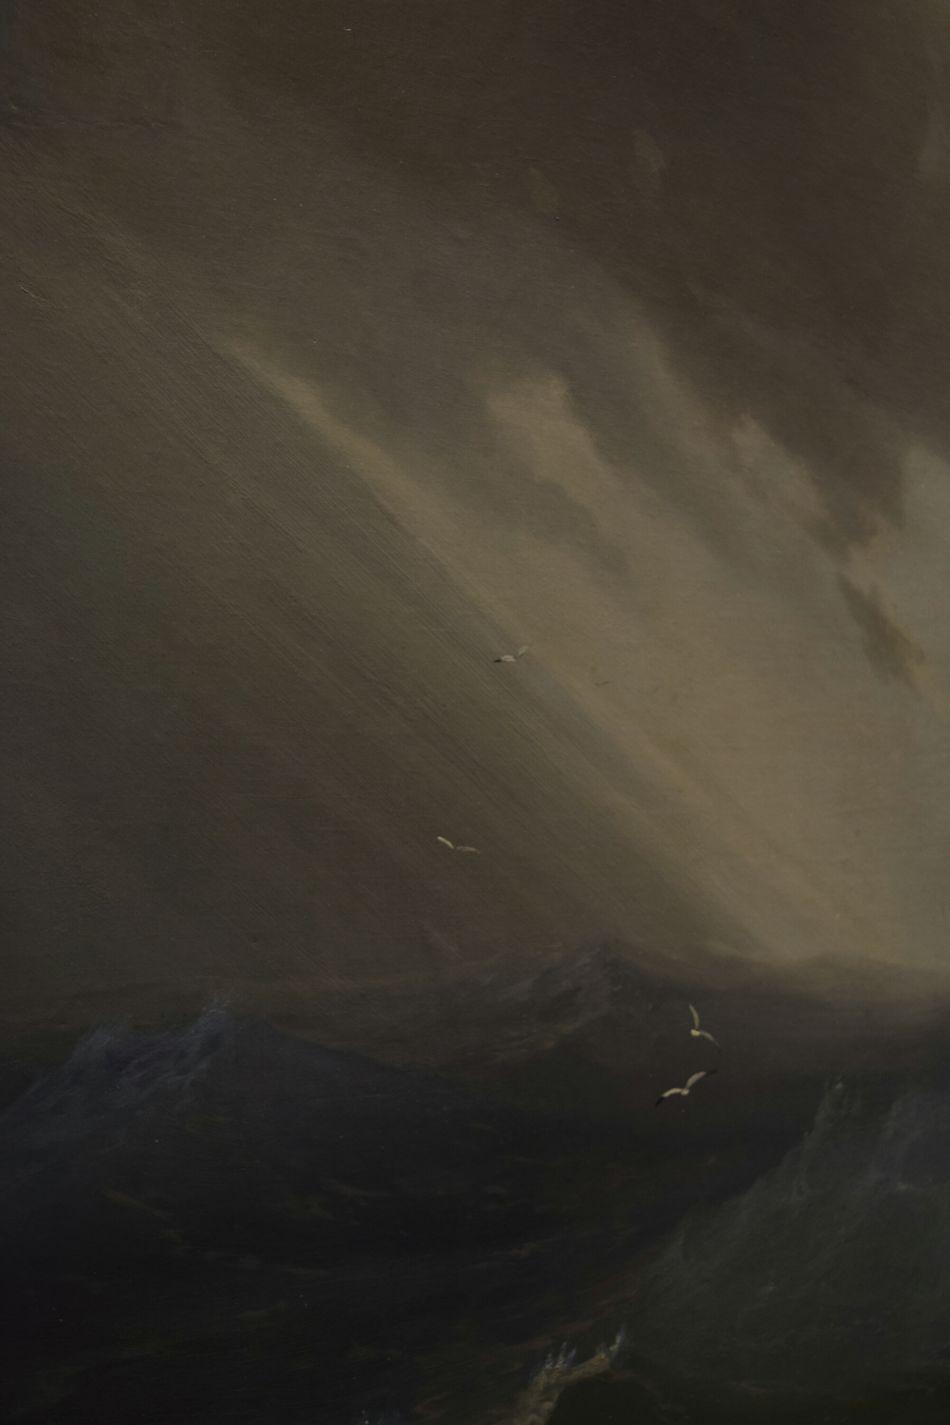 Aivazovsky Sea Beautiful Classic Textured  Picture классика Айвазовский шторм лучисолнца Sunlight Storm Cloud Storm